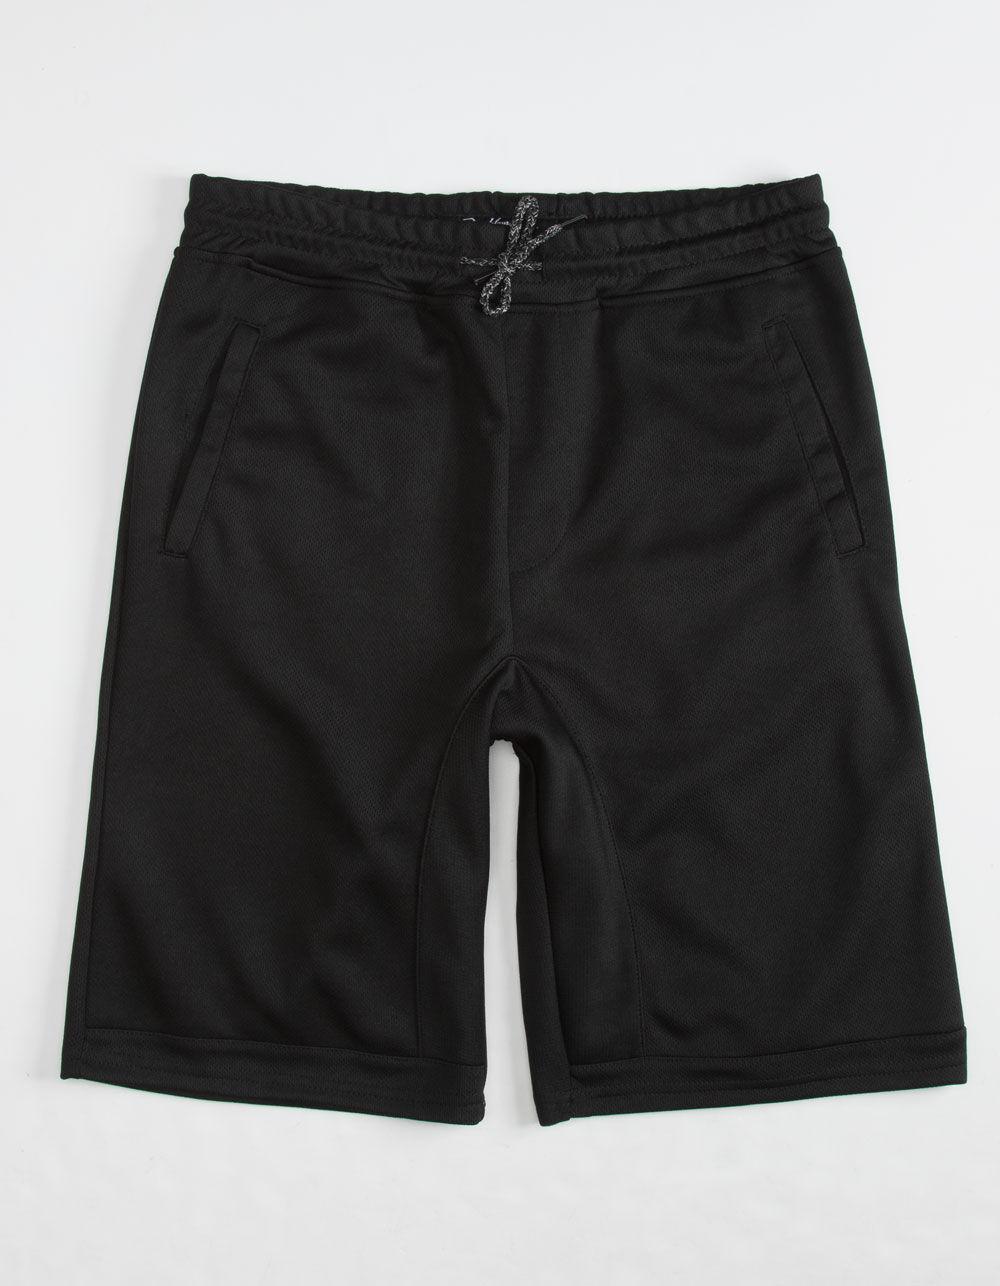 Image of BROOKLYN CLOTH MESH BOYS SHORTS